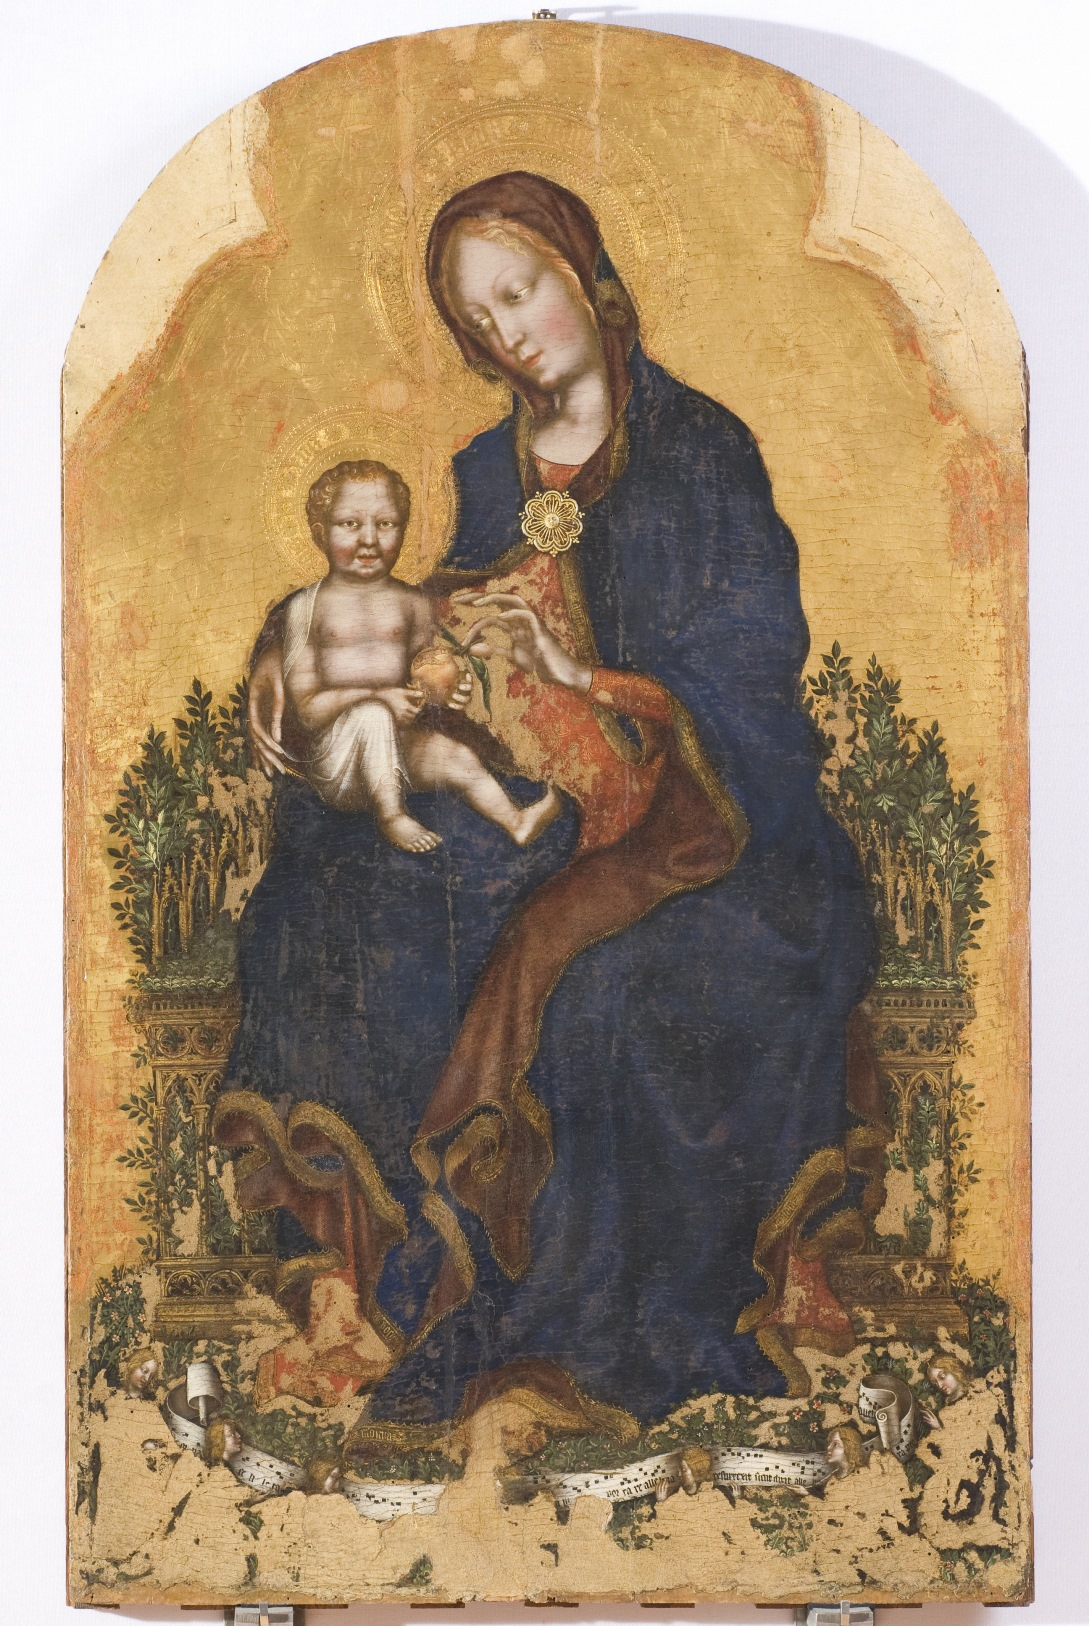 Italian Art of the Proto-Renaissance Period at the Hermitage